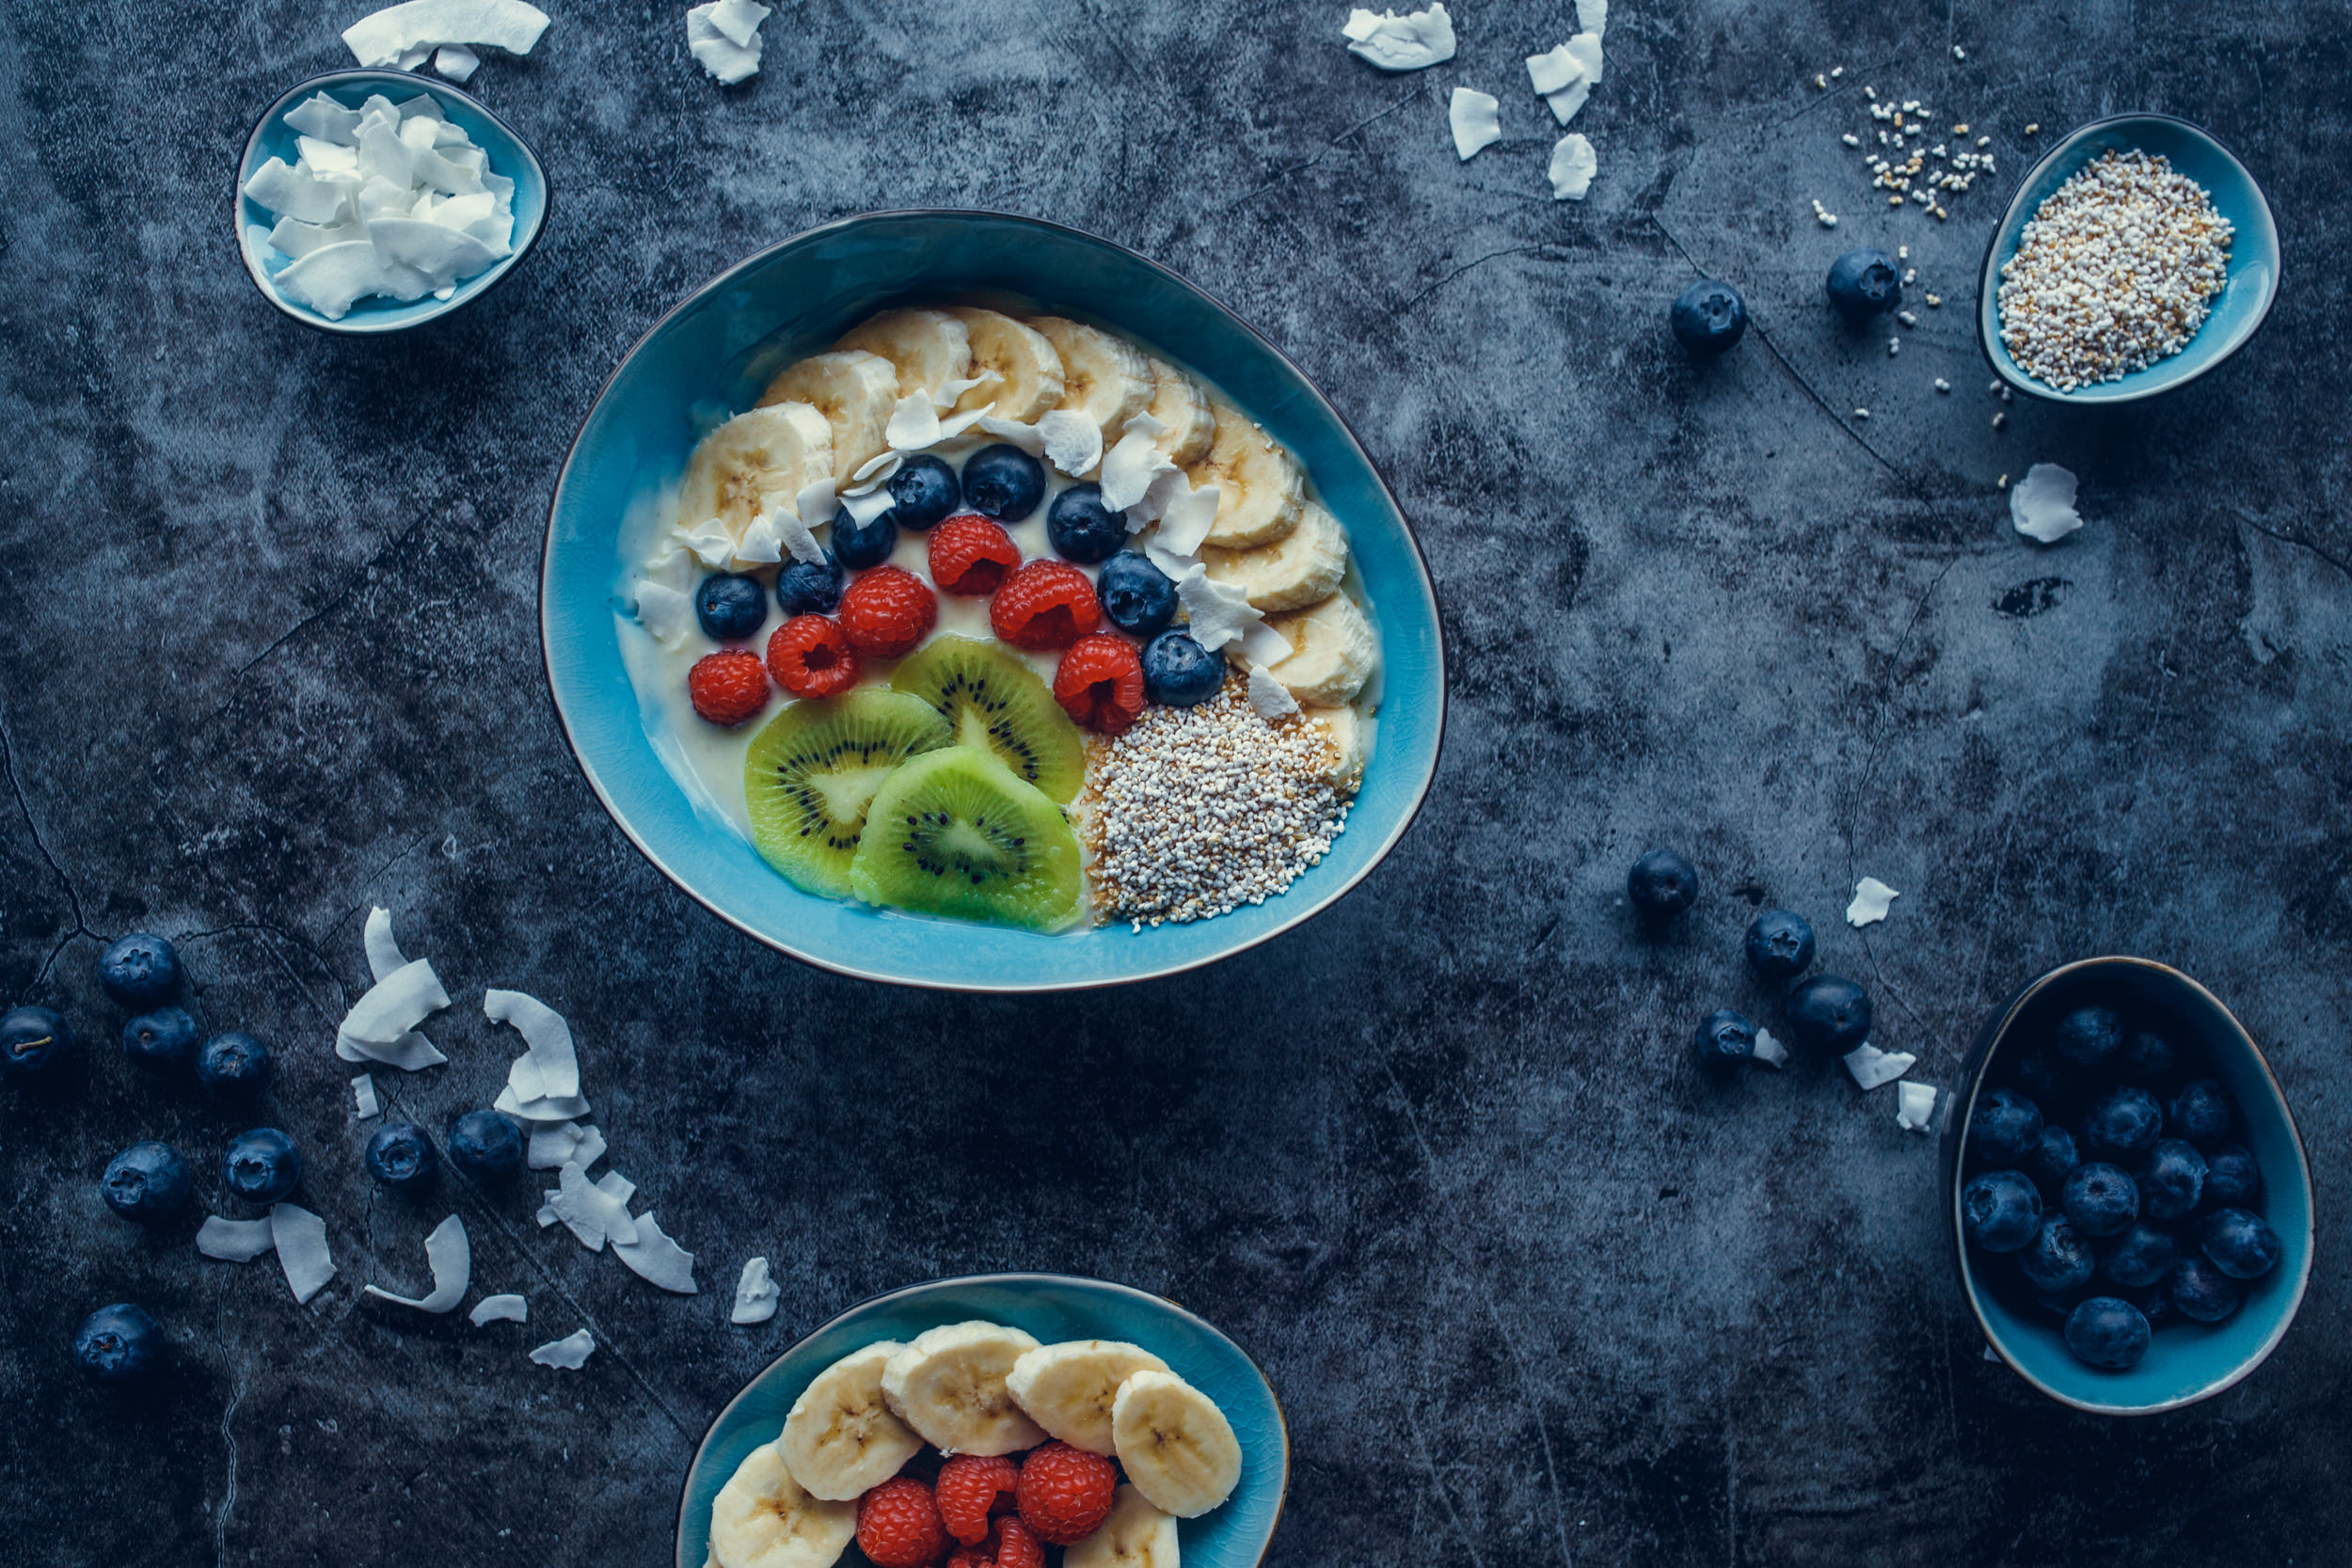 FOOD STUDIO PATRICKSCHMETZER IMG 9 Food